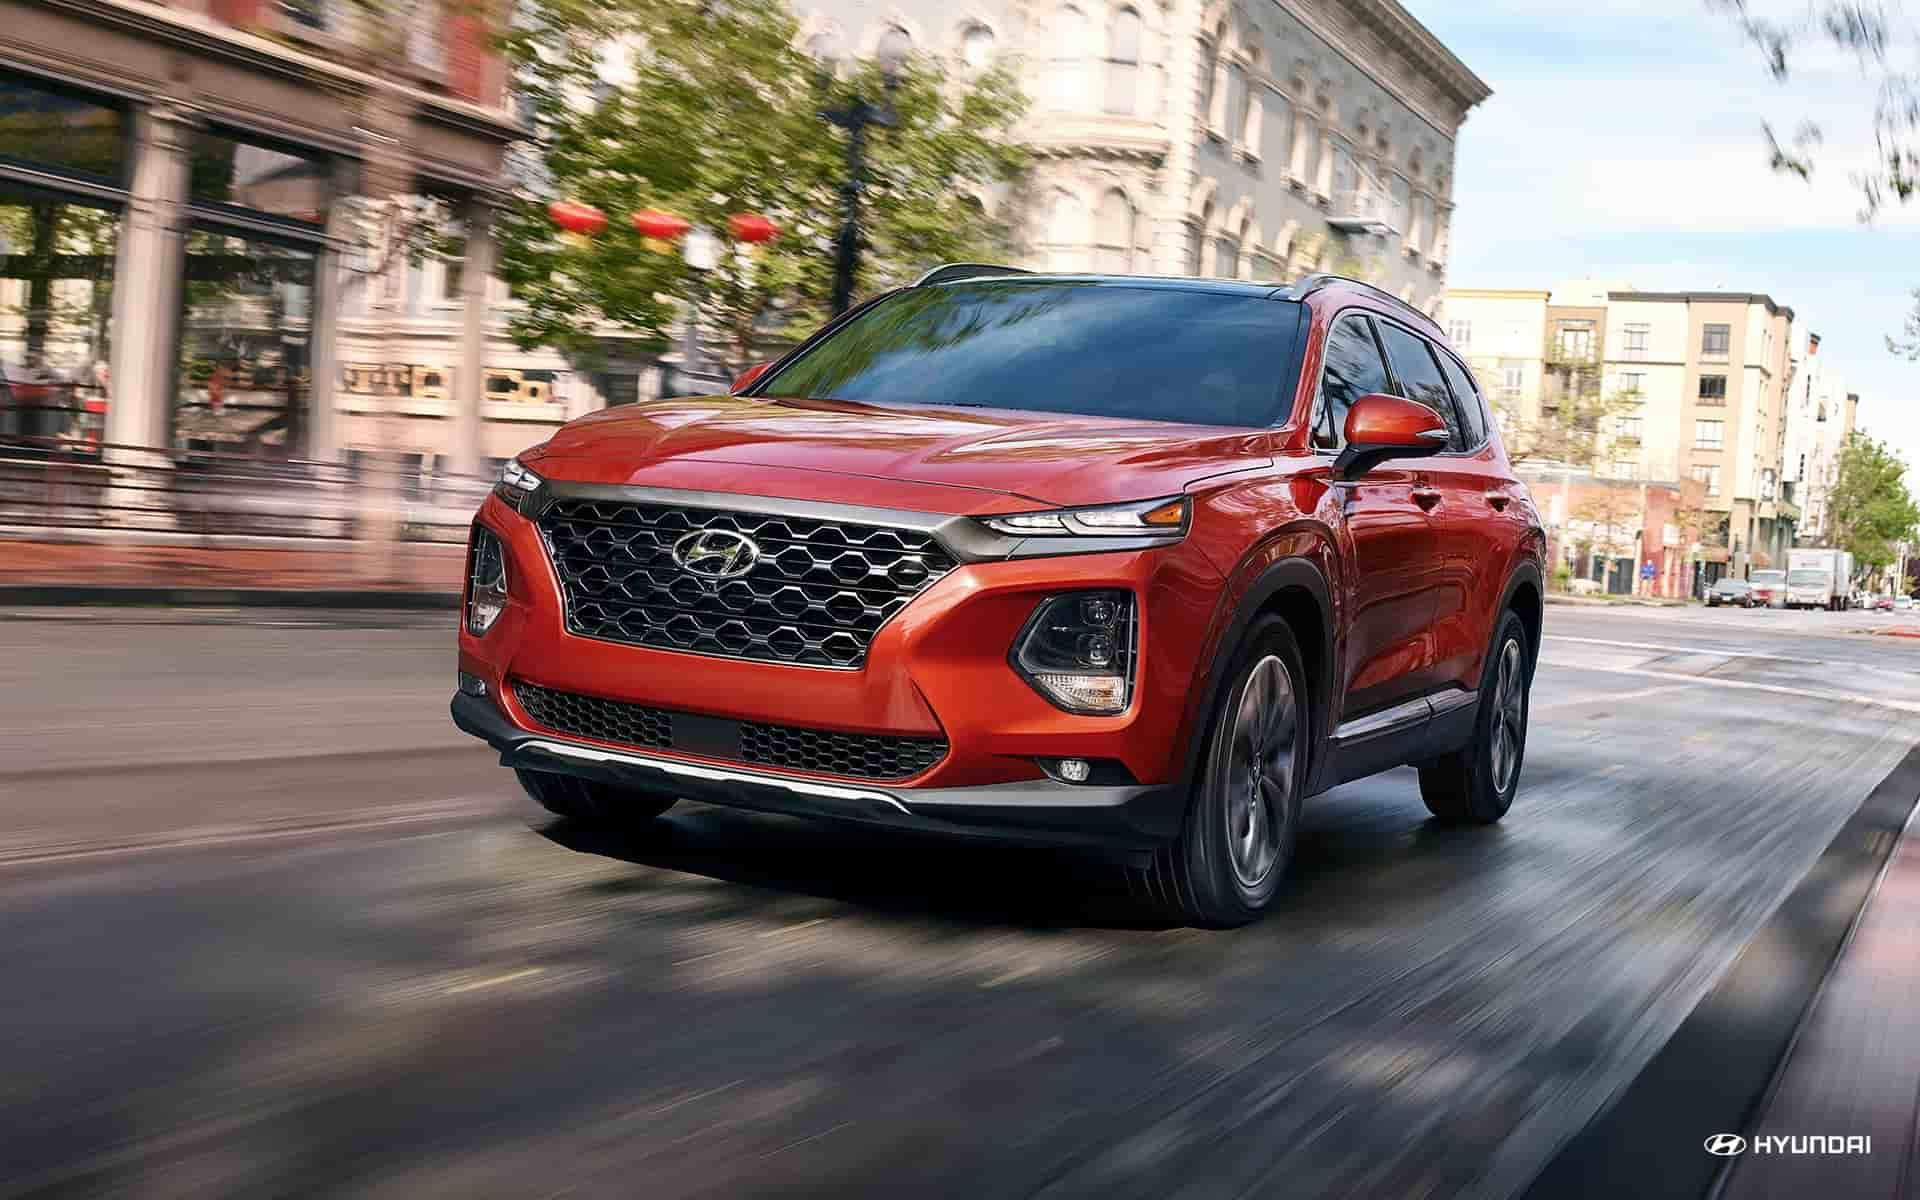 Buy a SUV Online 2020 Hyundai Santa Fe Near Denver CO